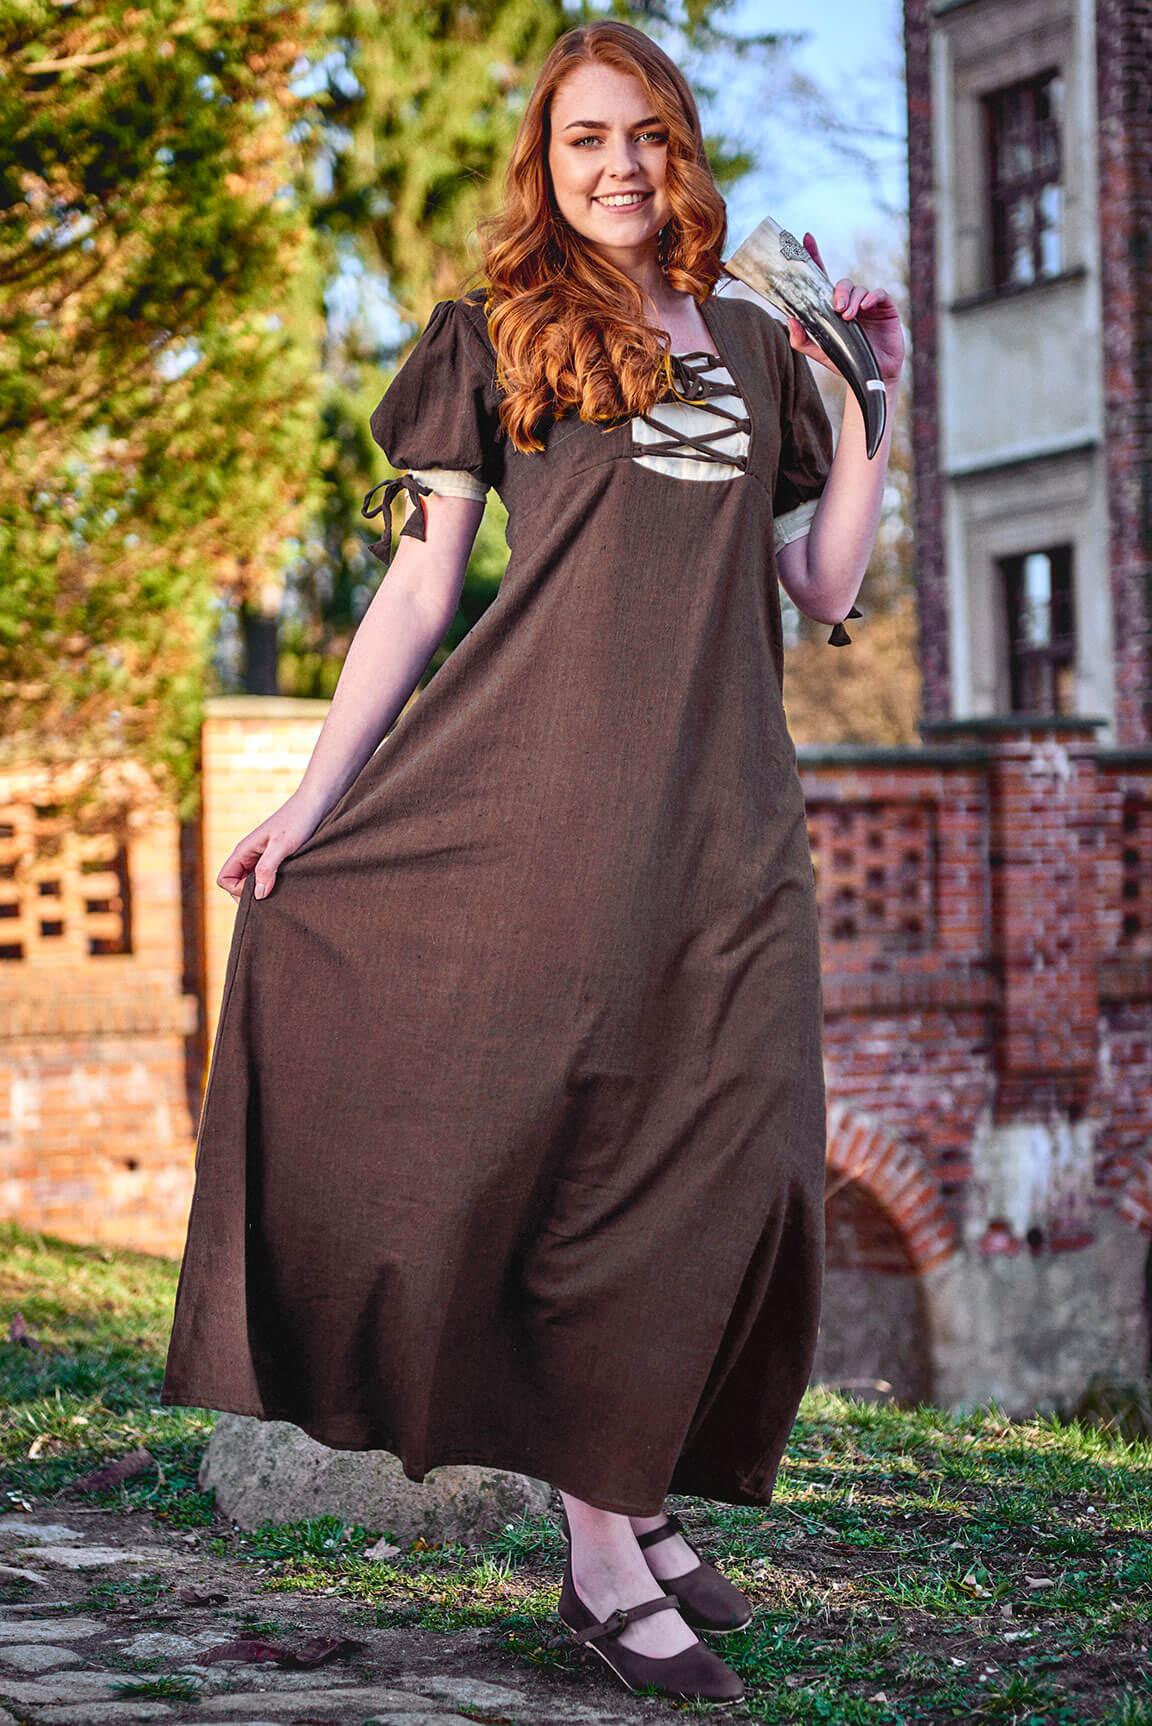 Mittelalter-Kleider